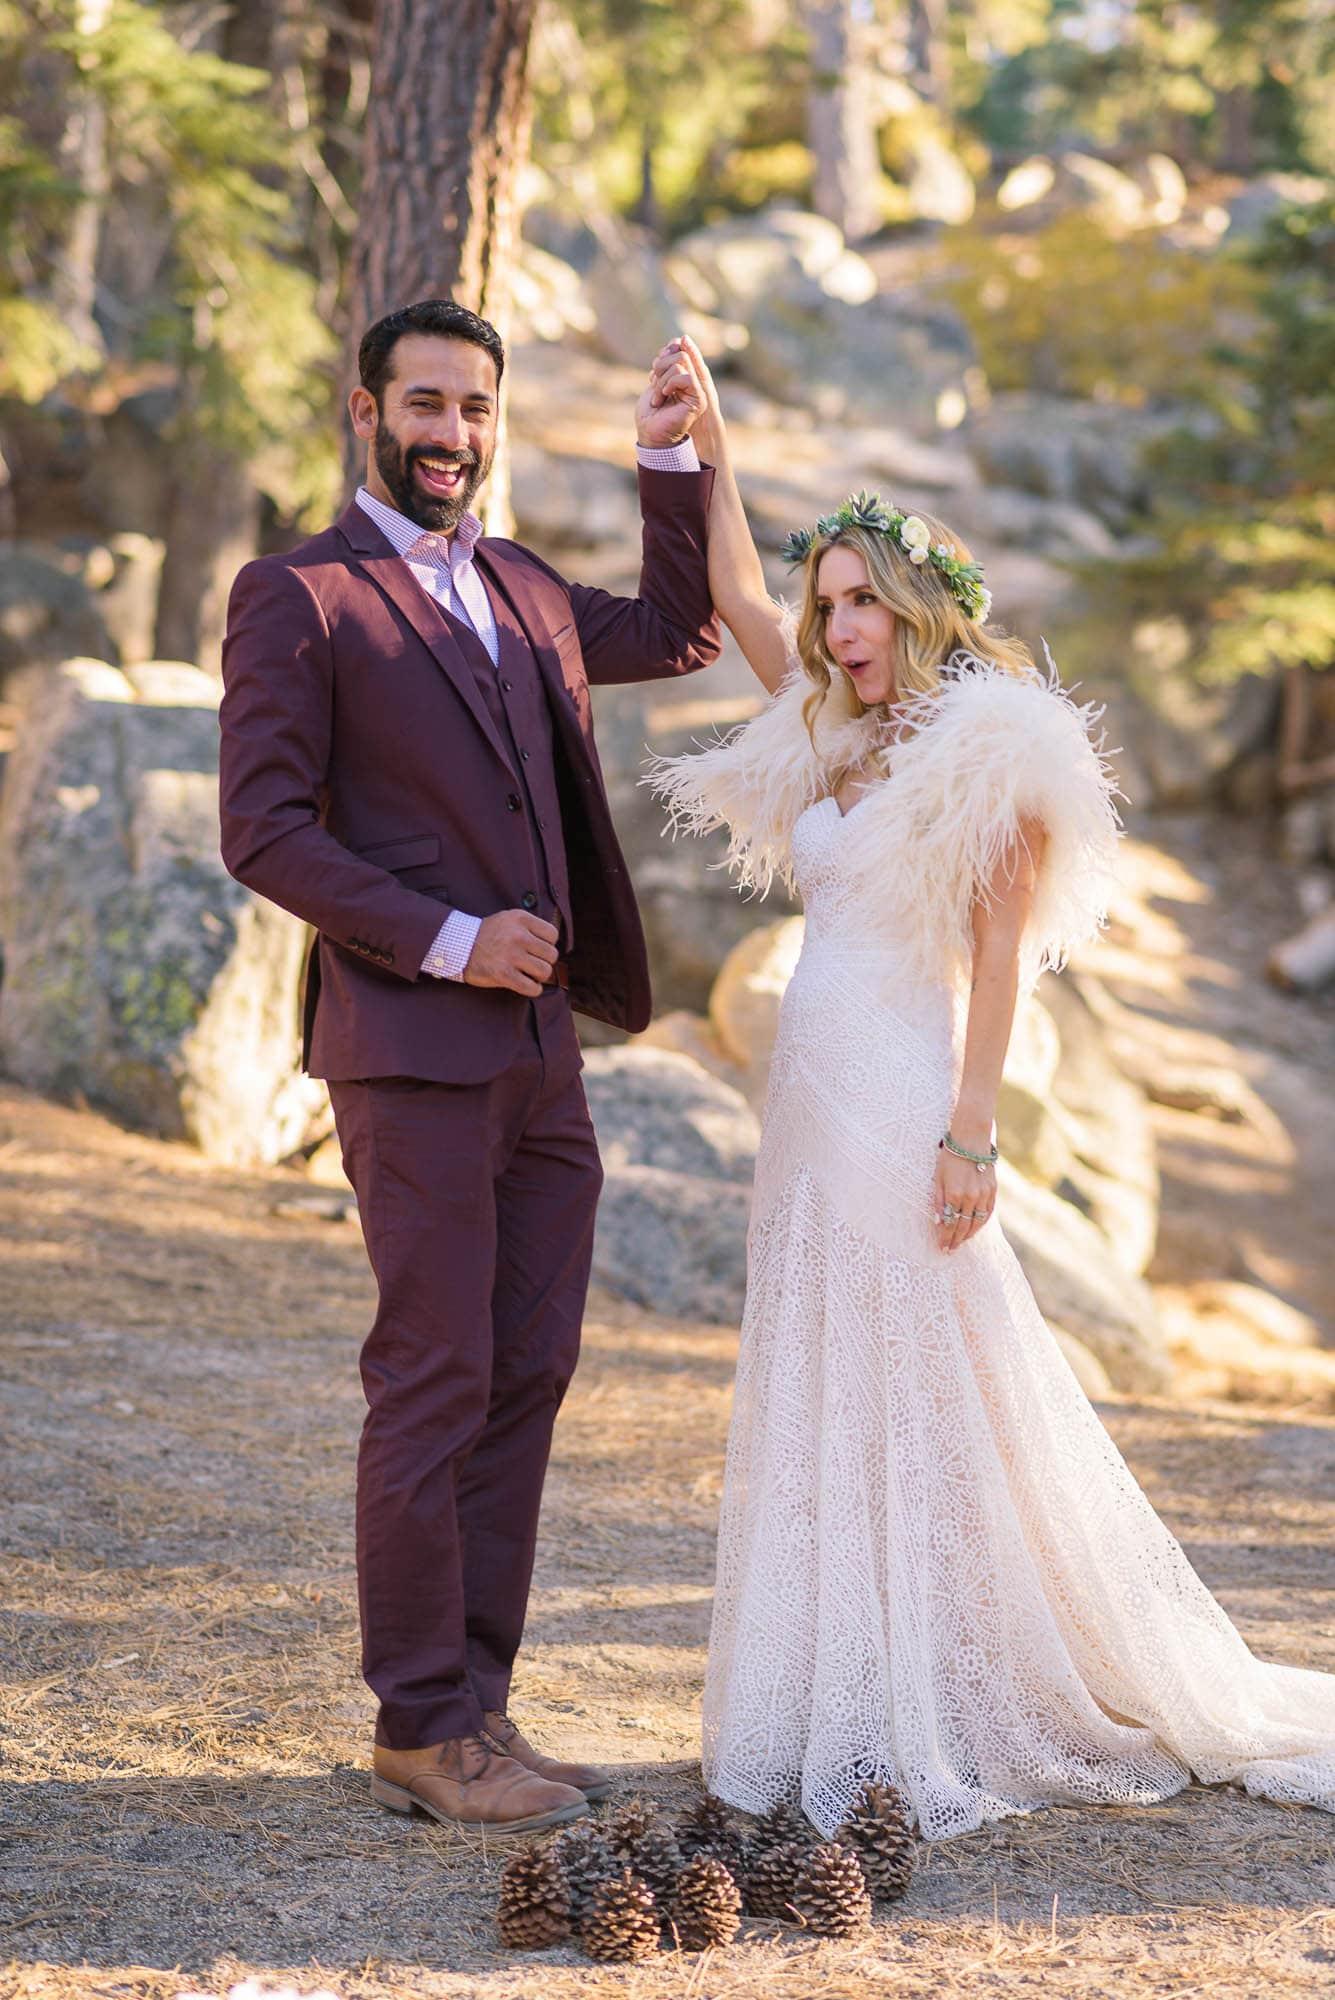 029_Alan_and_Heidi_Wedding_Natalie_Mike